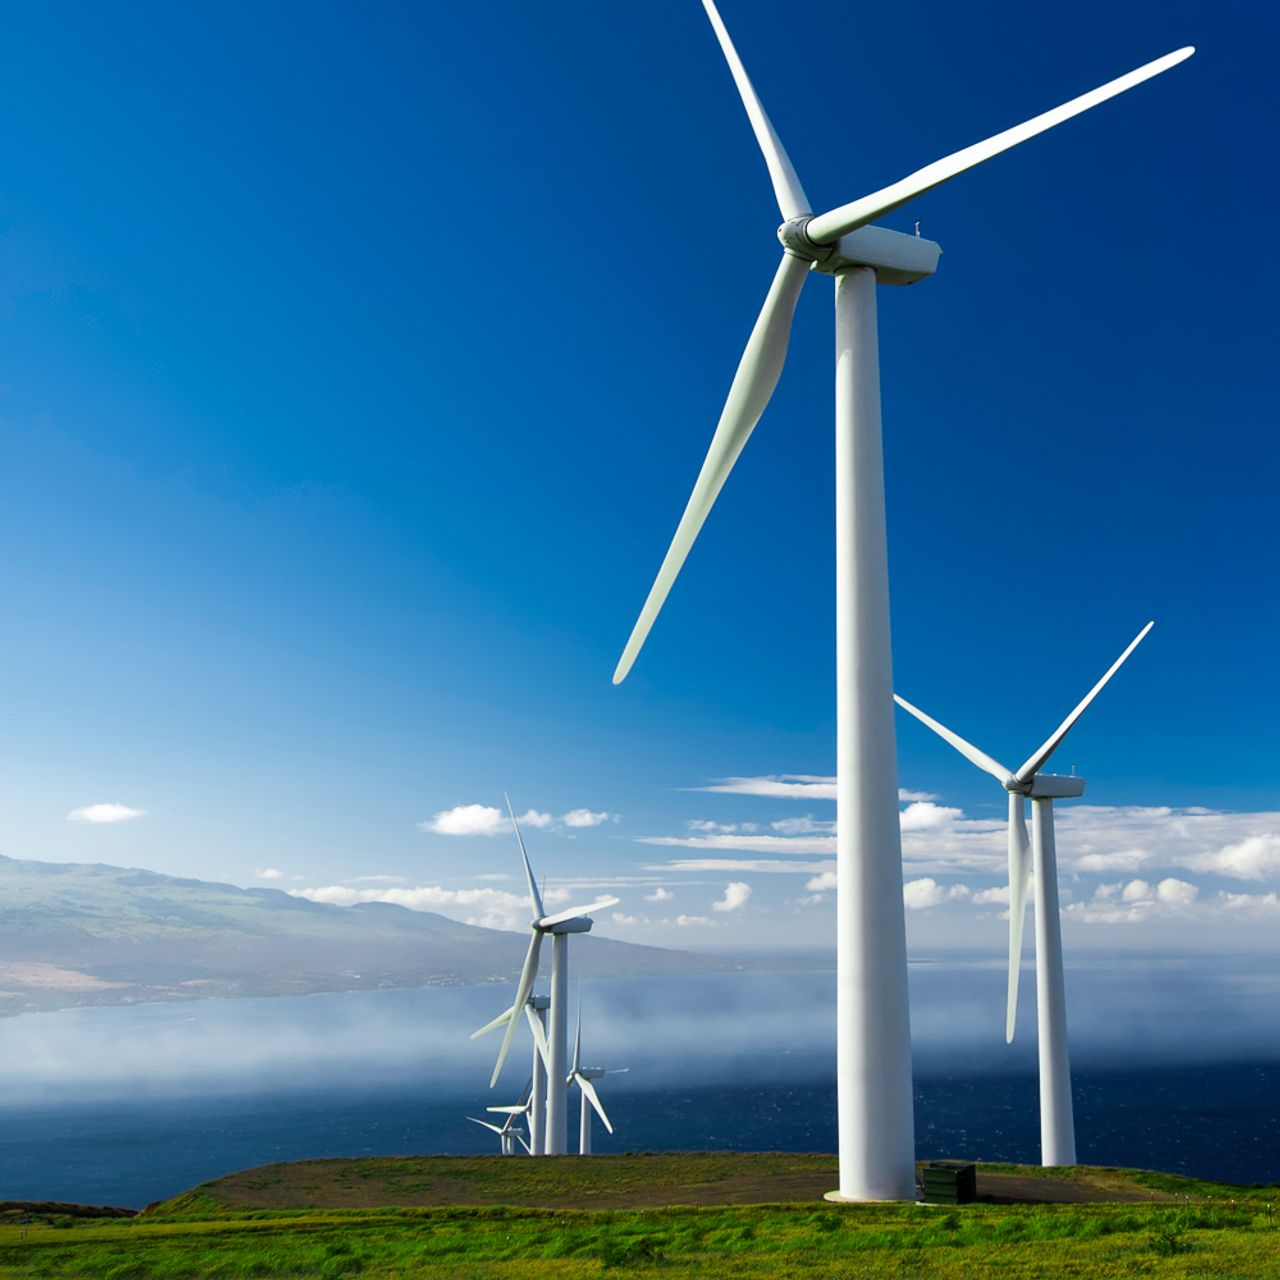 Windmill Power Generation